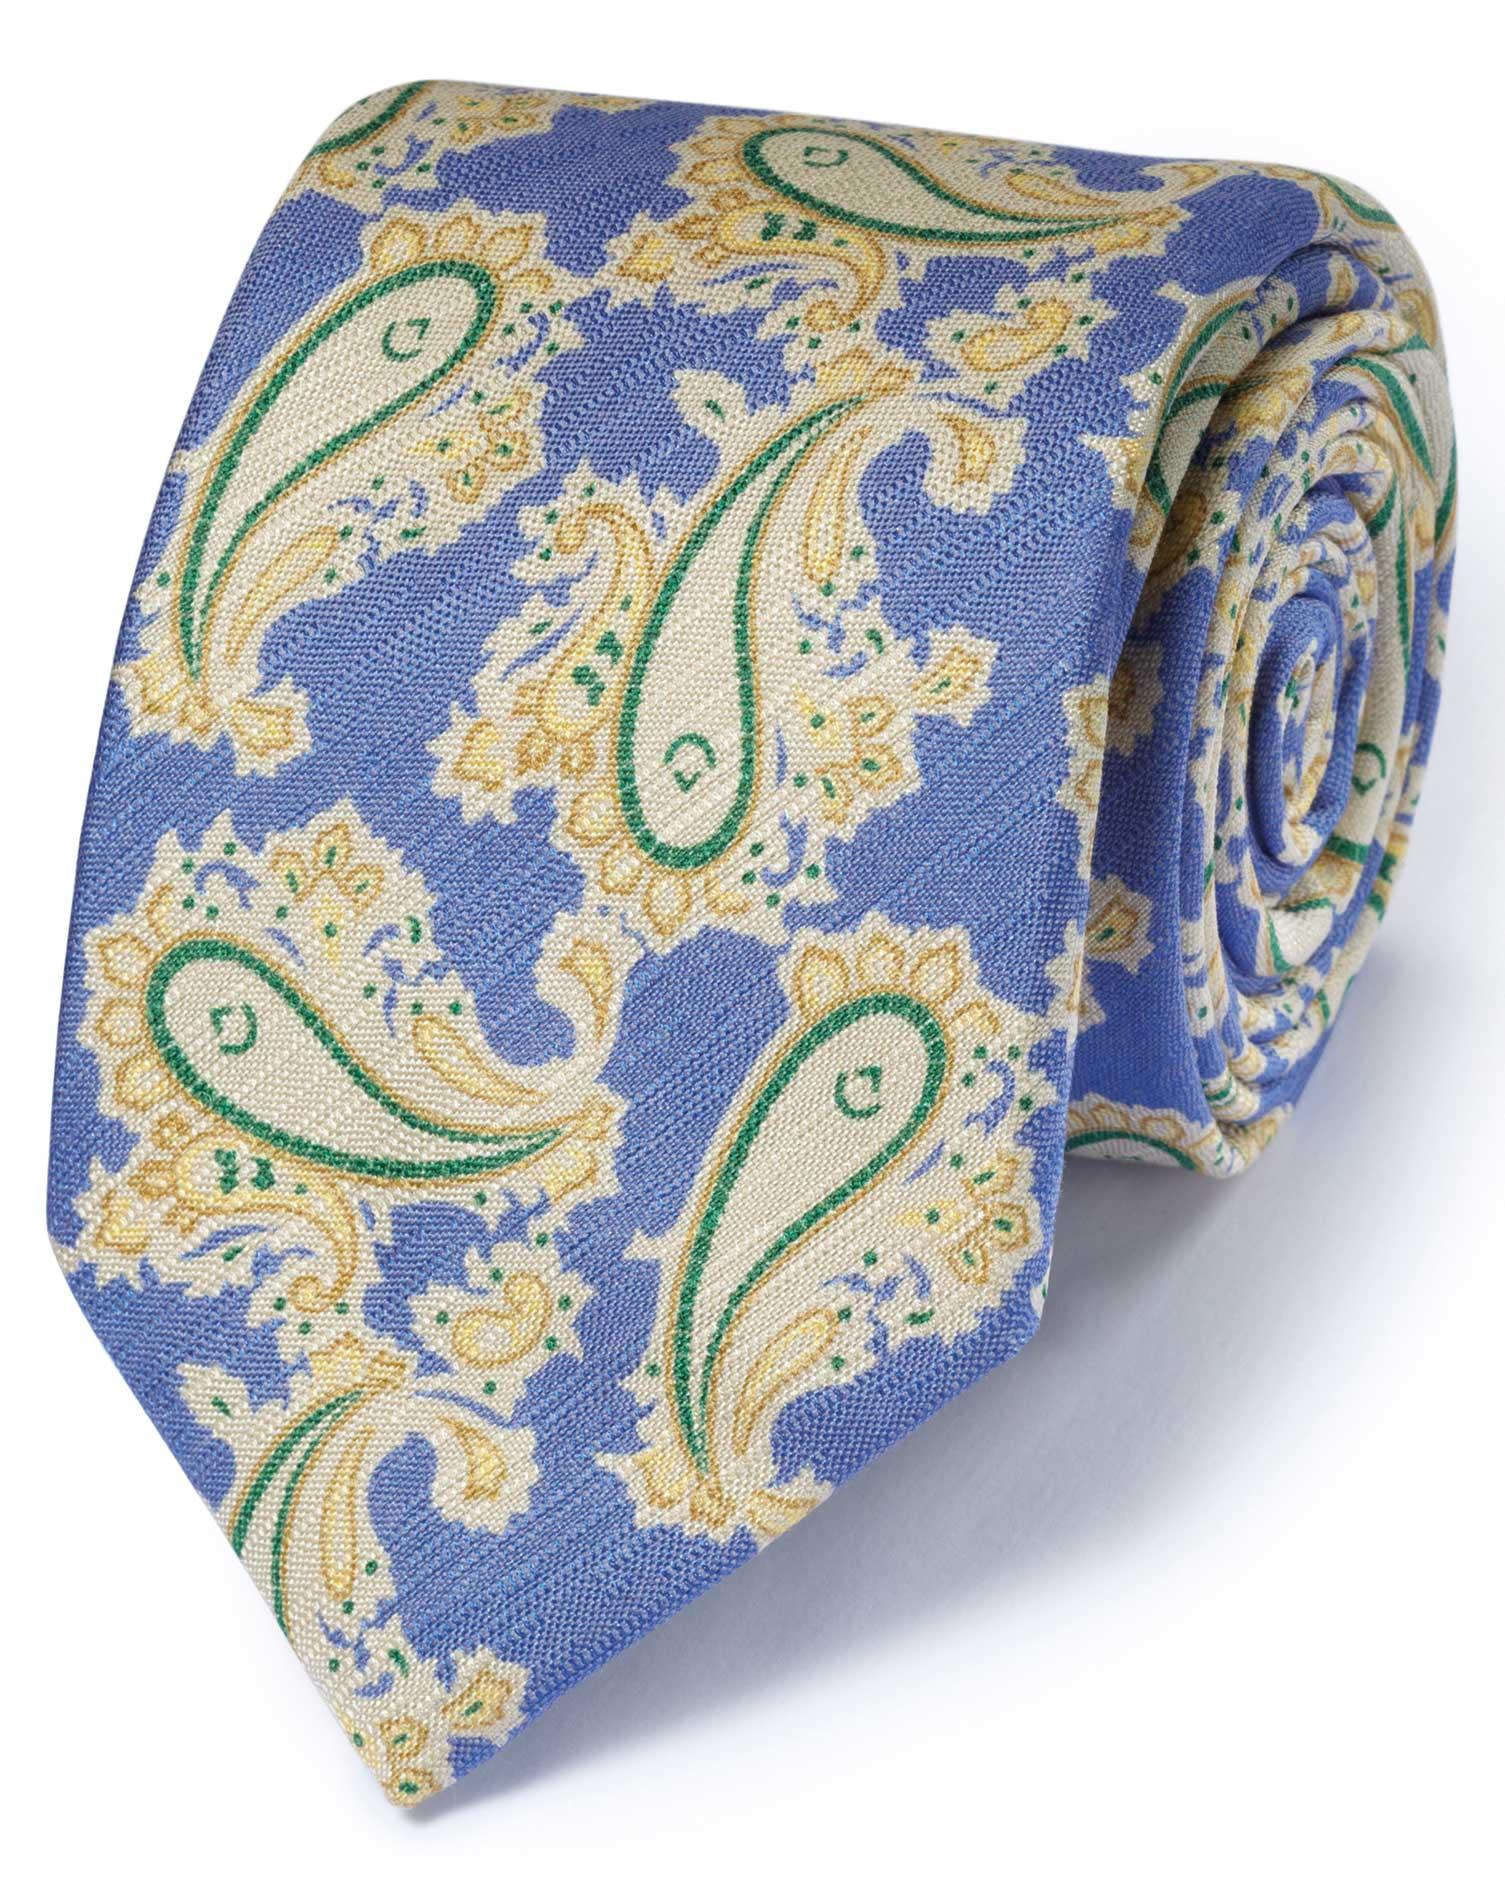 Blue Cotton Mix Printed Paisley Italian Luxury Tie Size OSFA by Charles Tyrwhitt